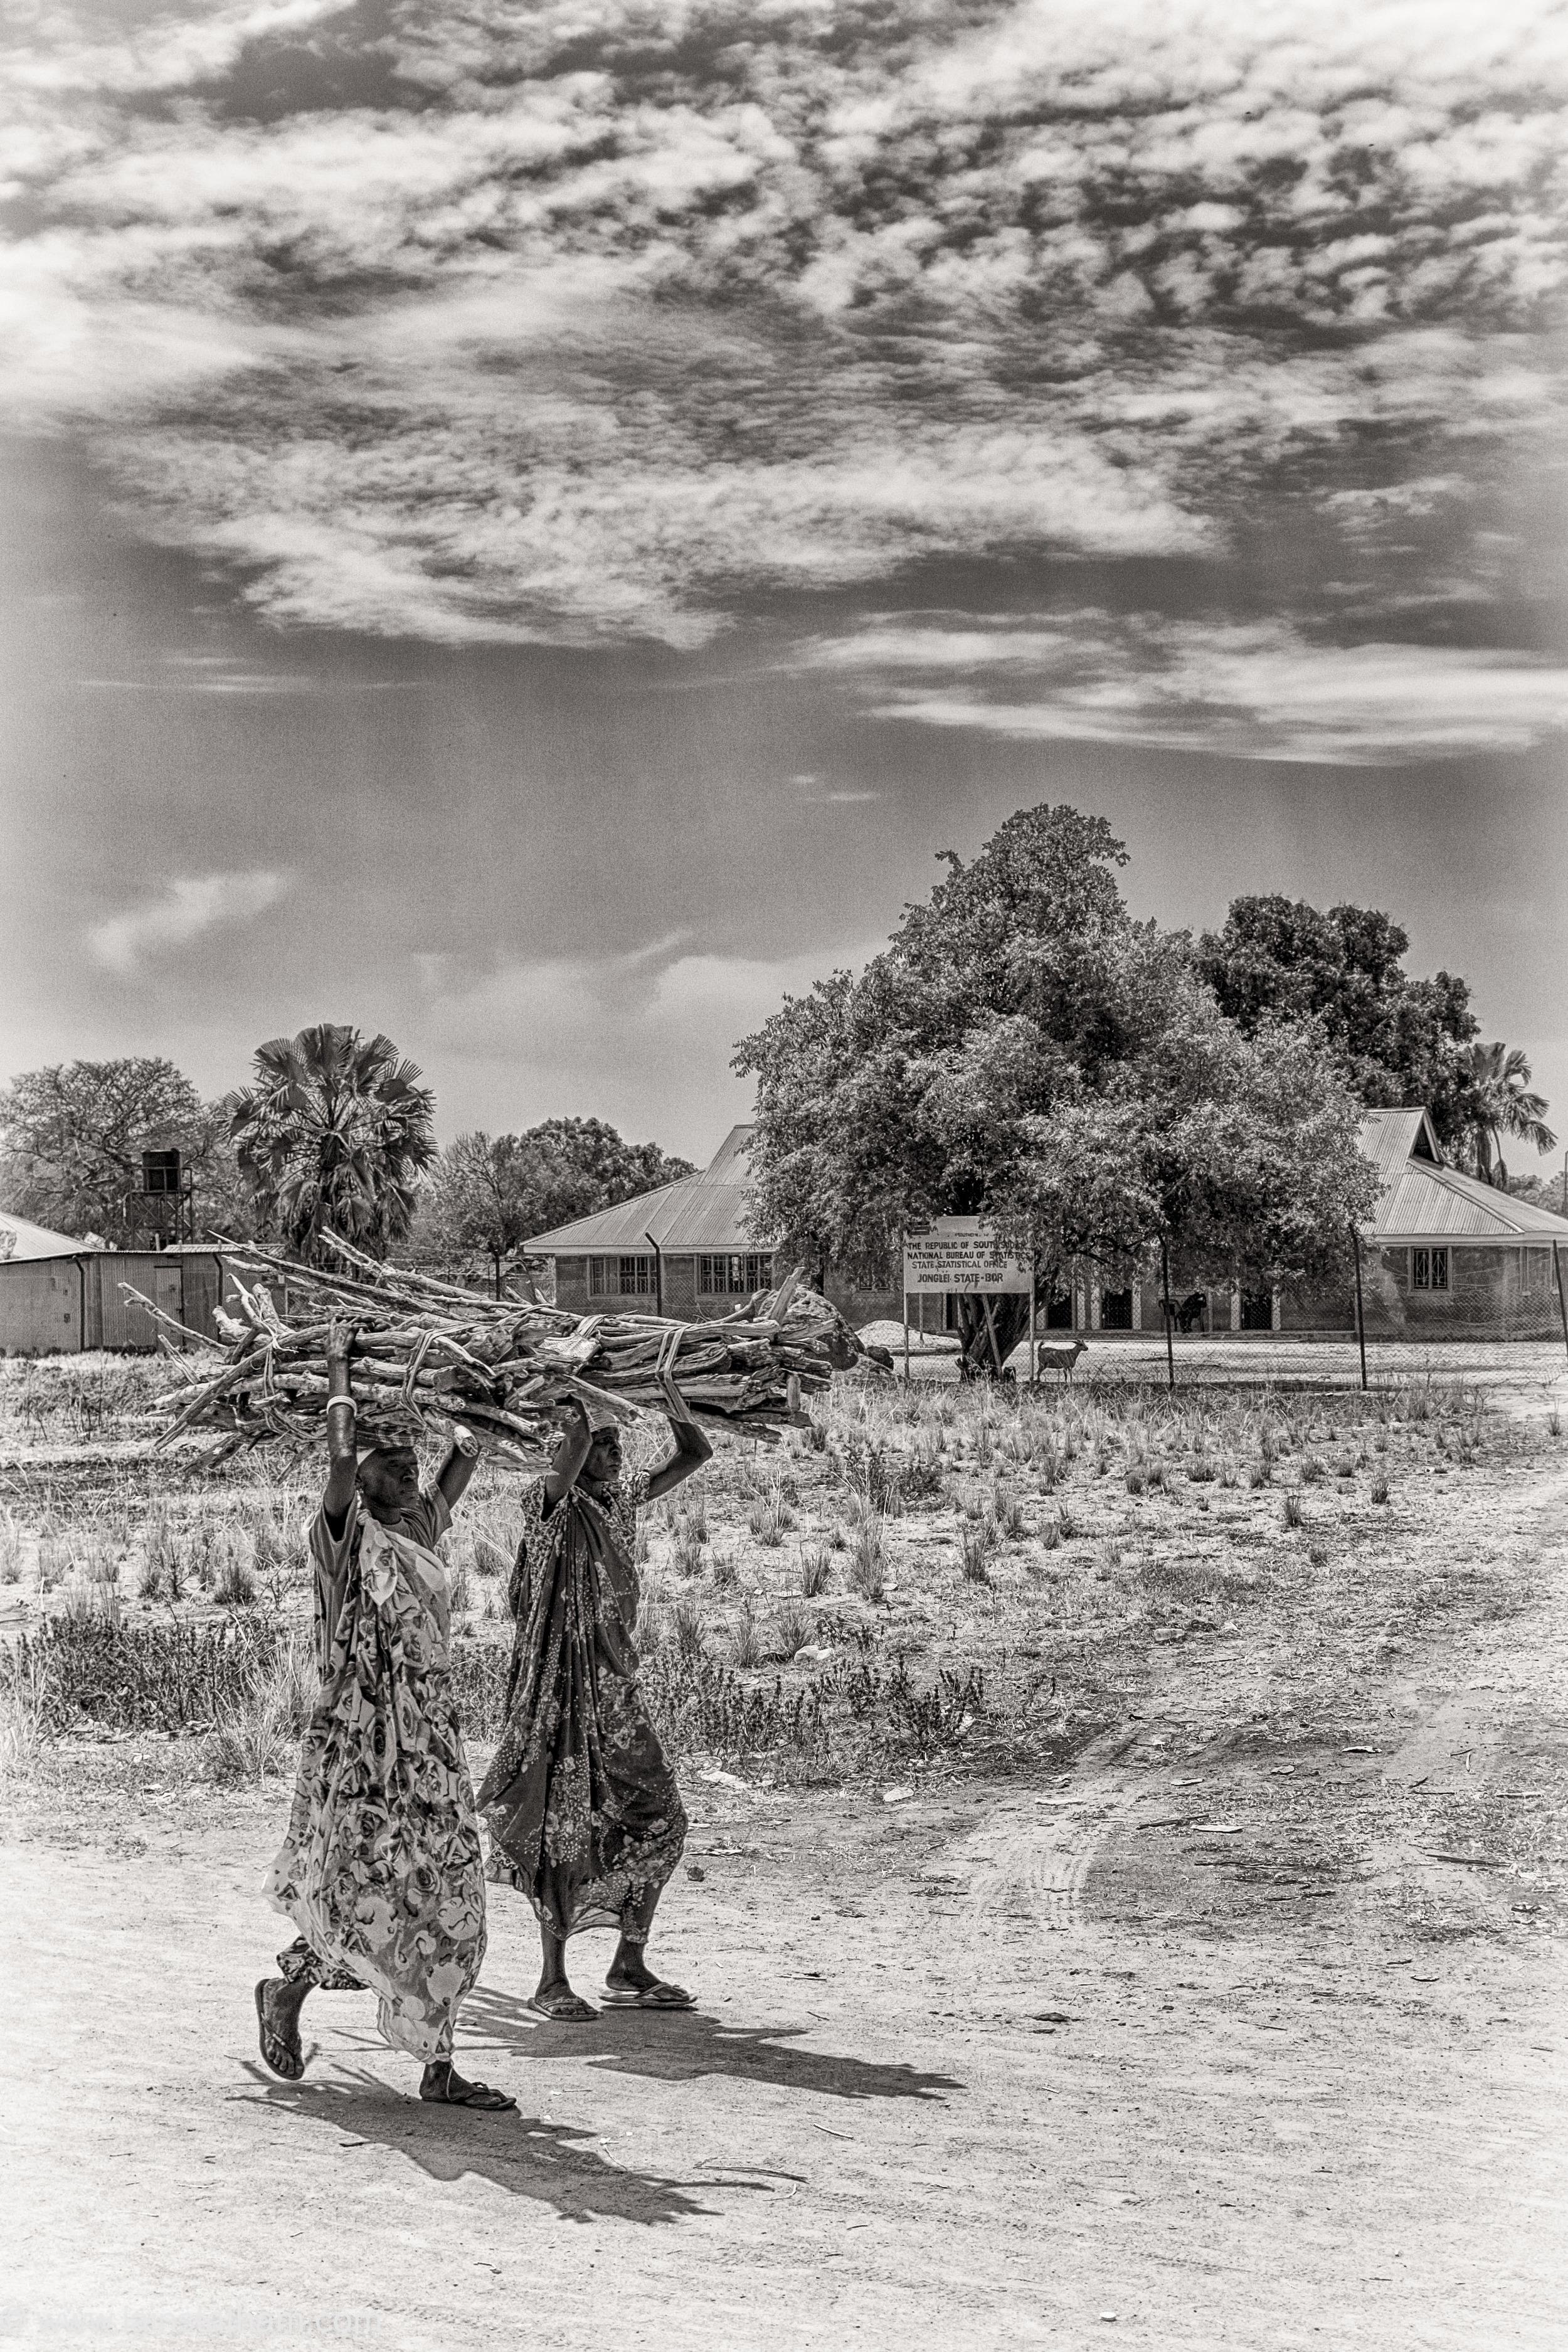 south sudan - unmiss - bw - 2016-11.jpg